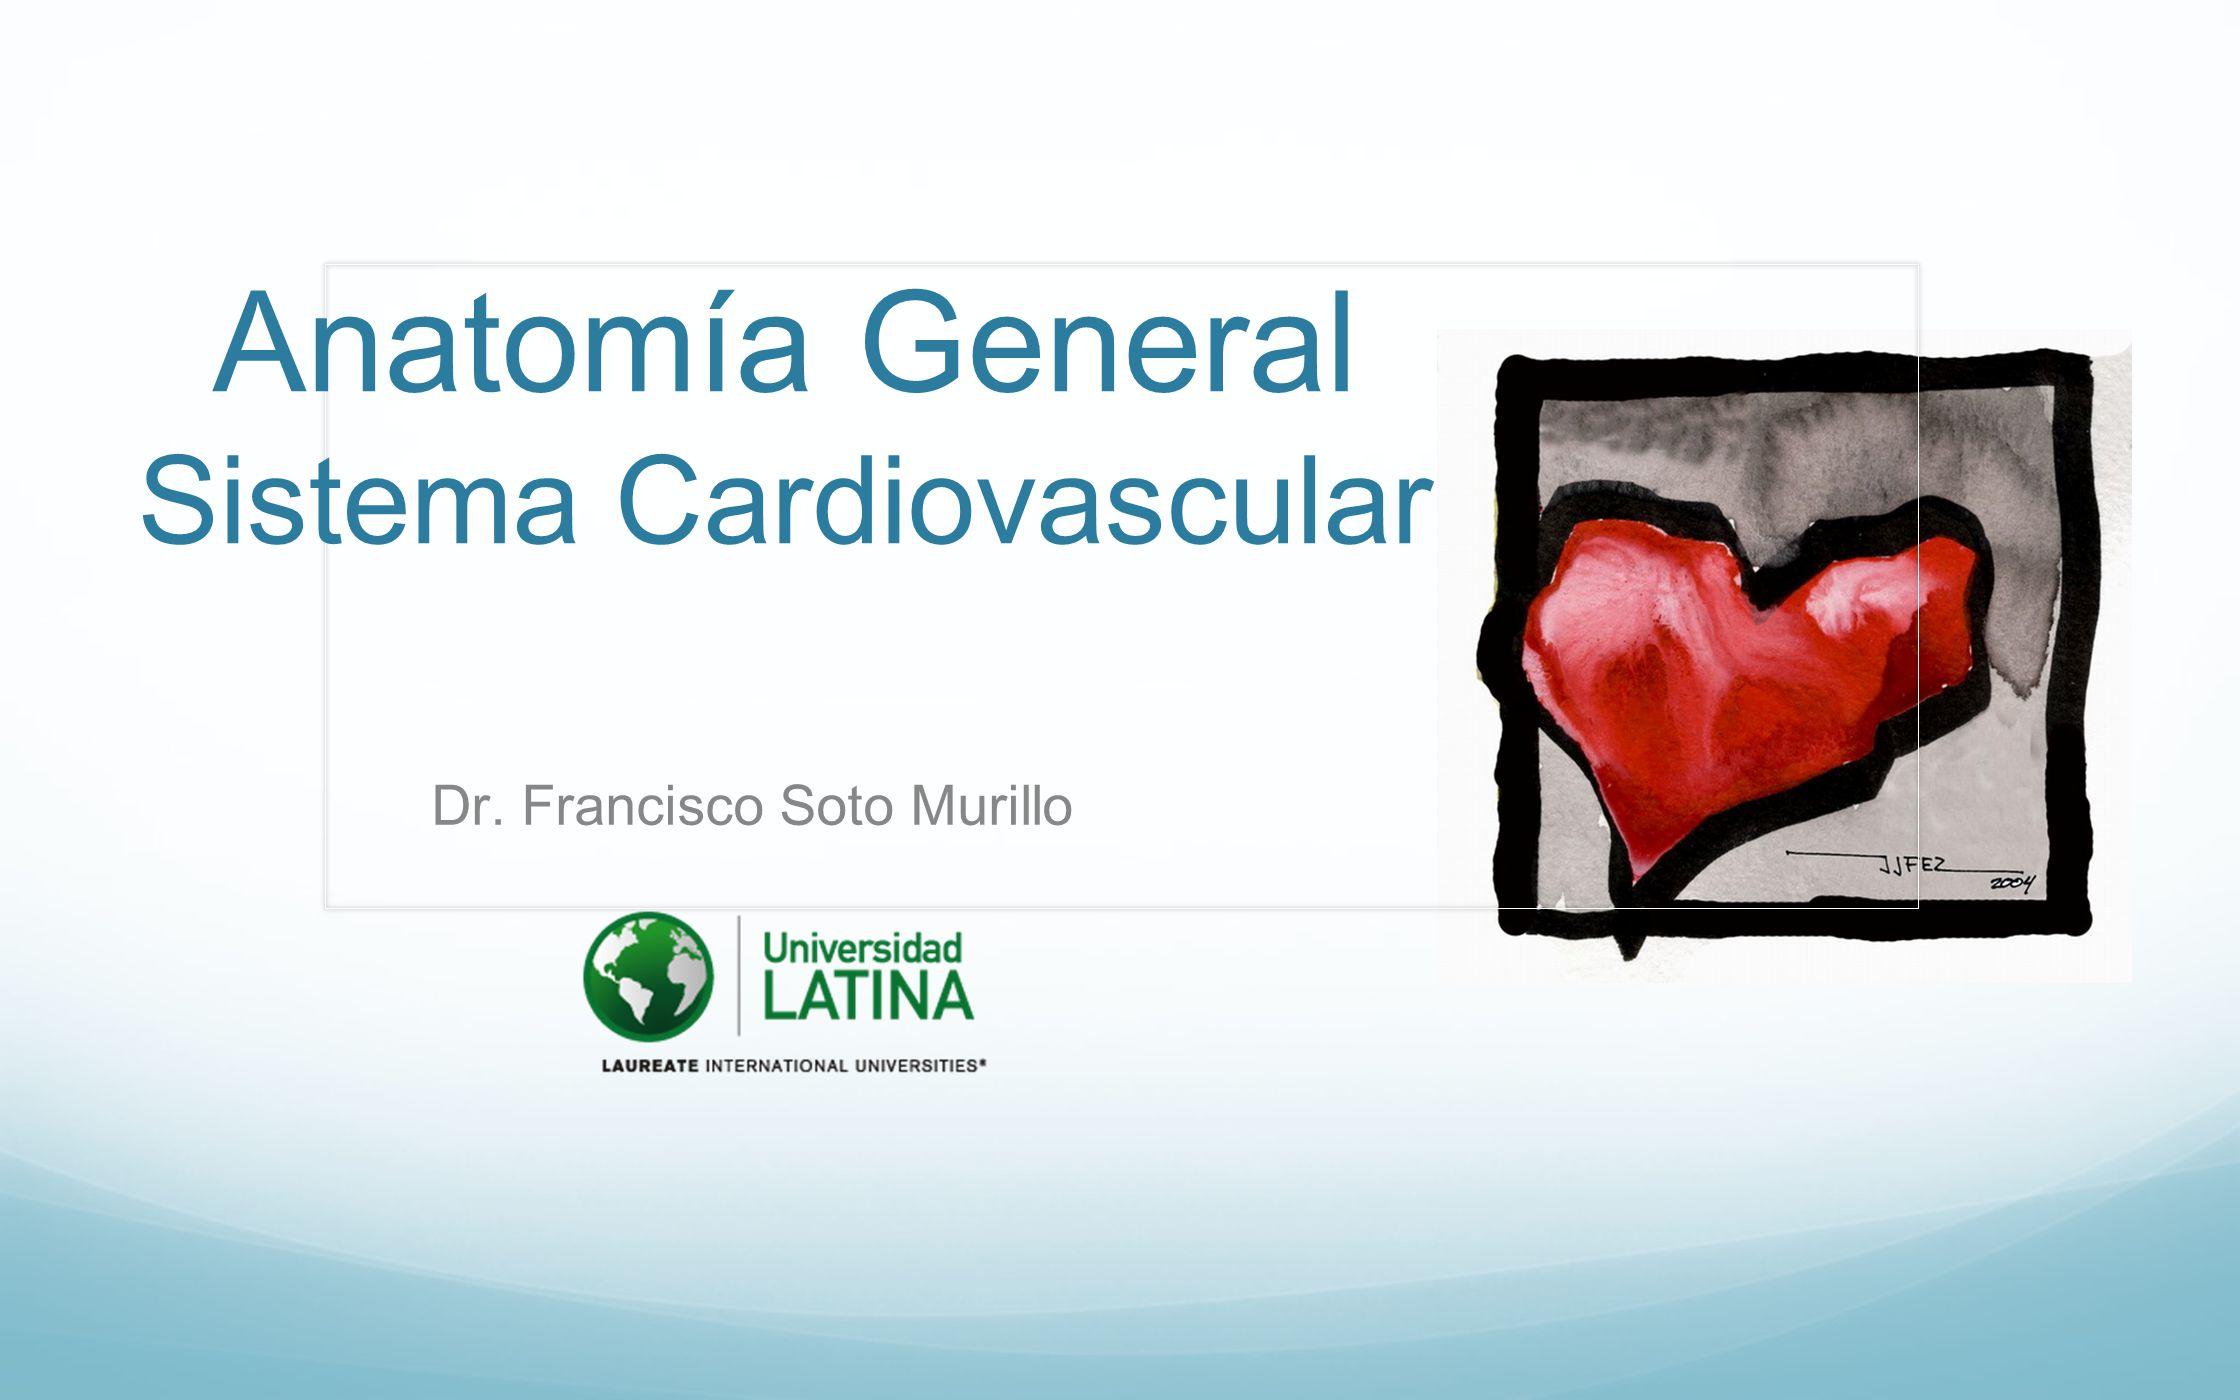 Anatomía General Sistema Cardiovascular - ppt video online descargar